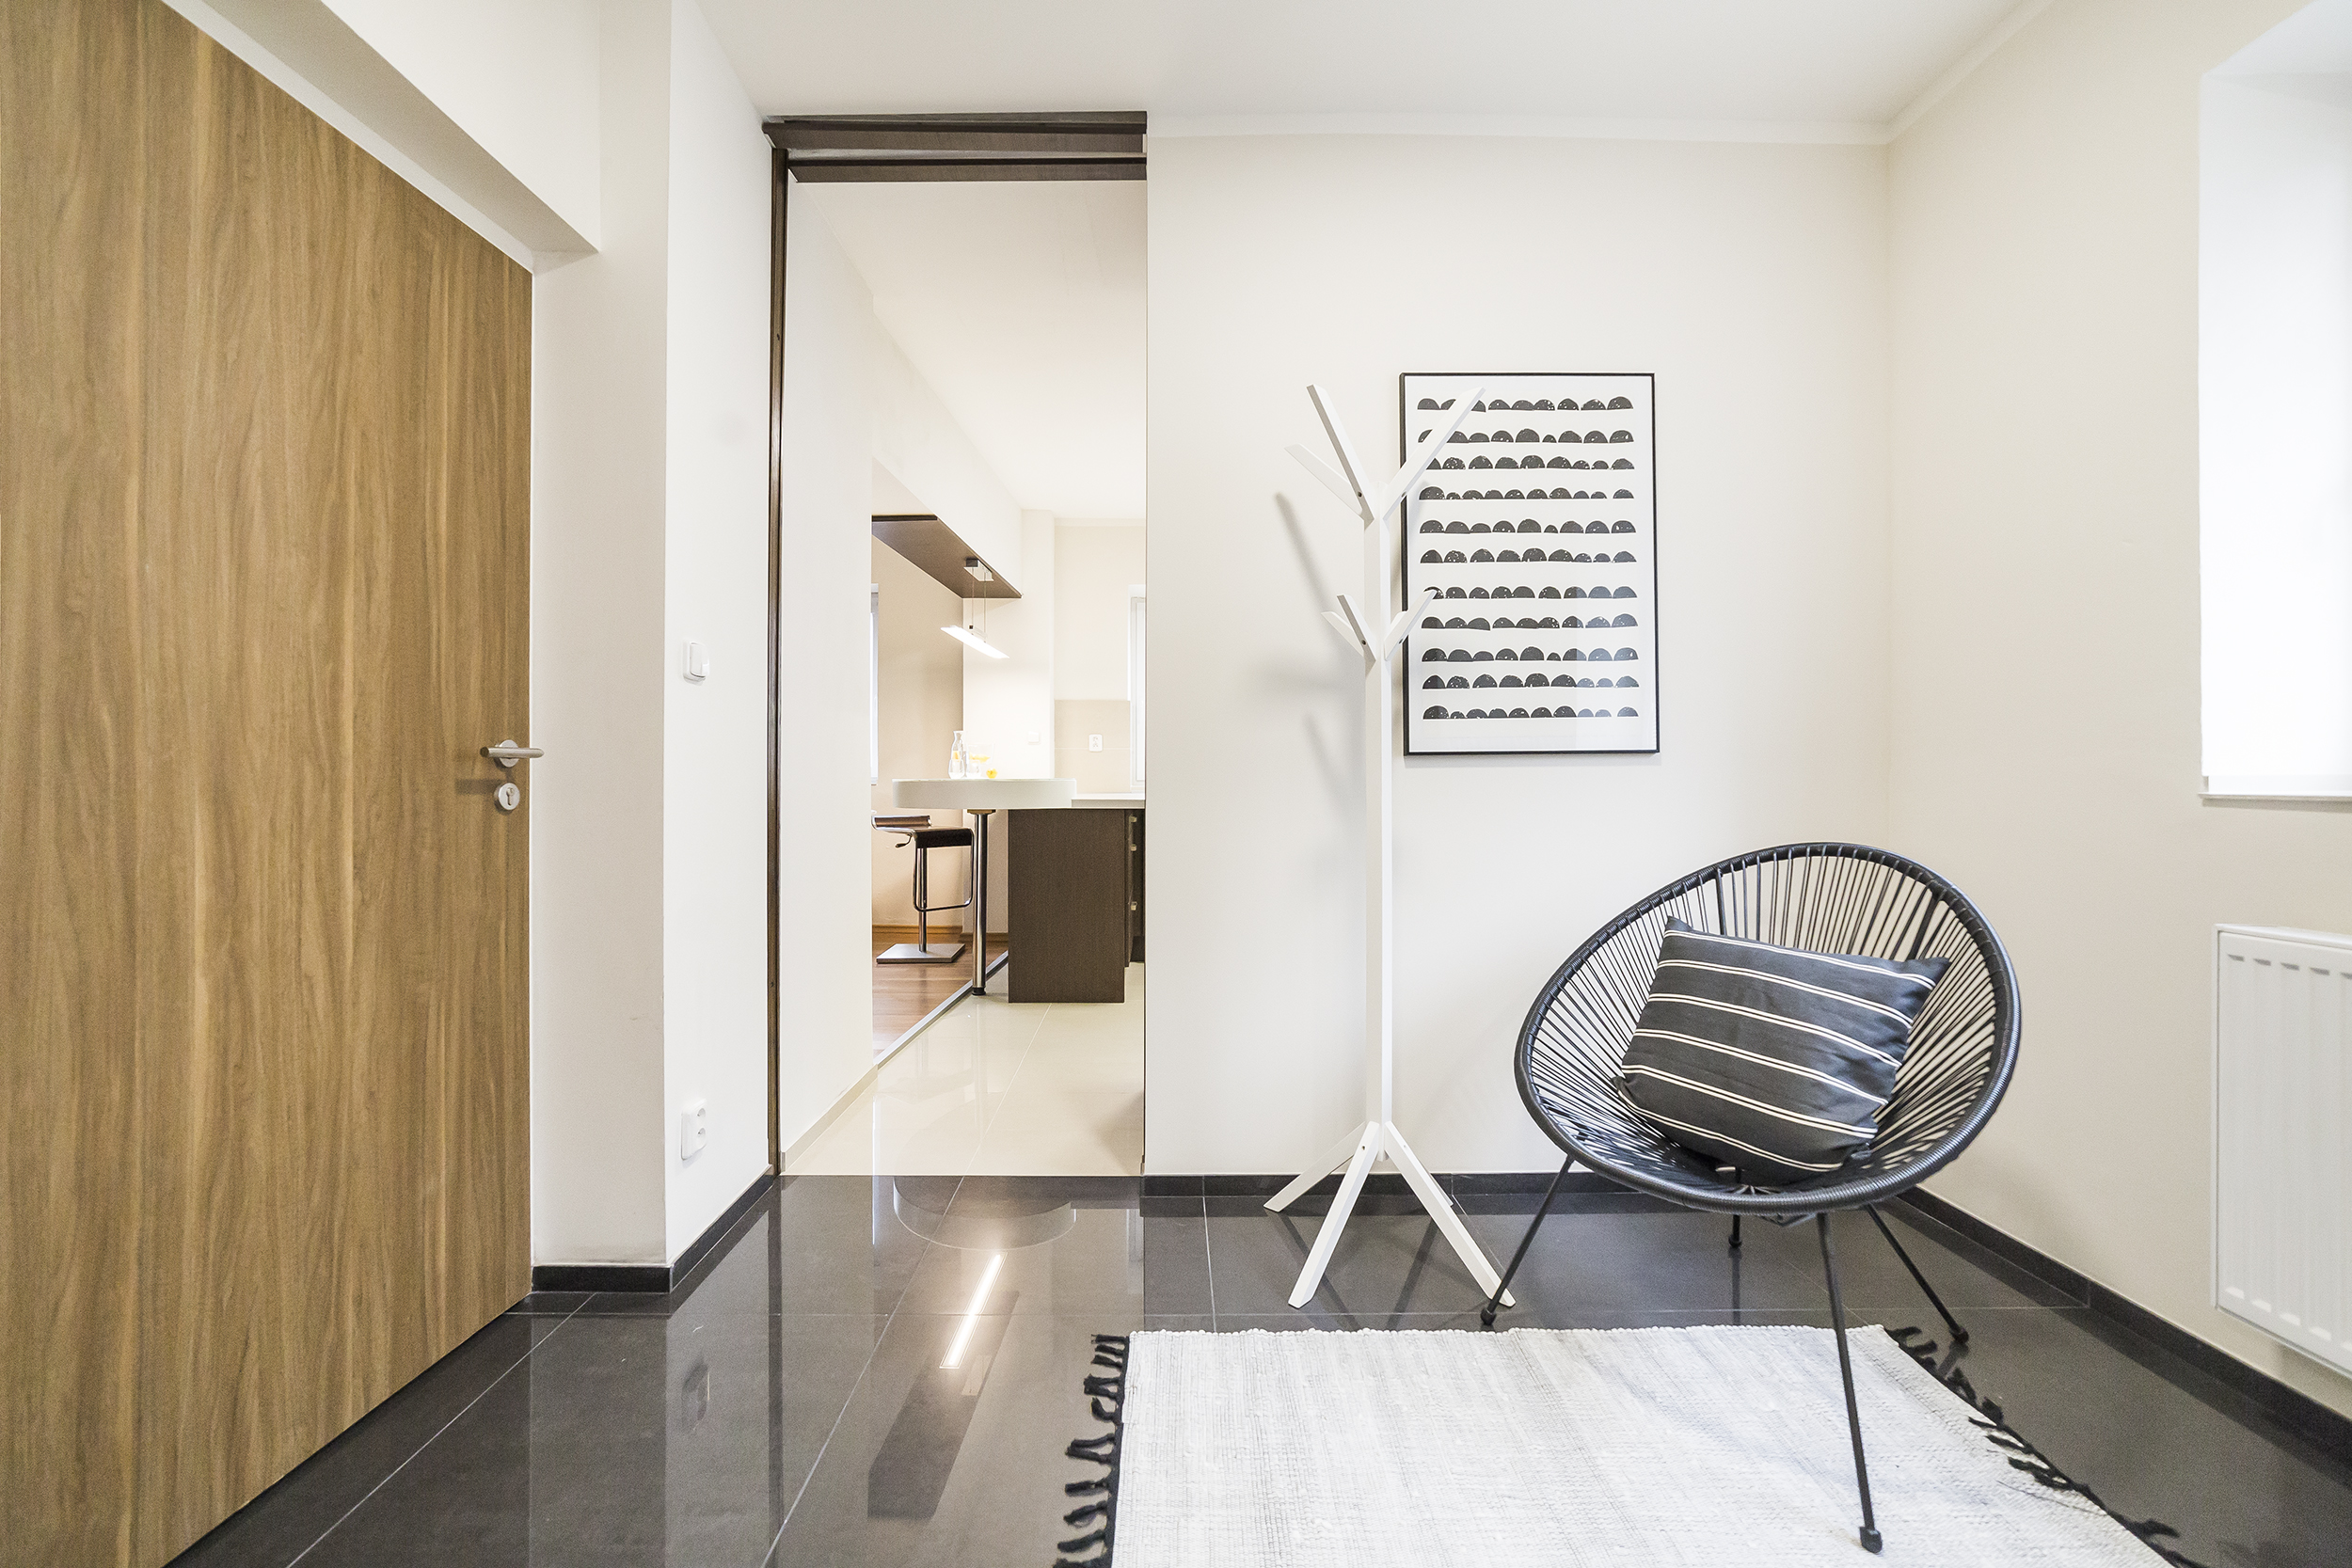 obraz vesak kreslo koberec podlaha dvere klika radiator okno prodej bytu opava linda bittova